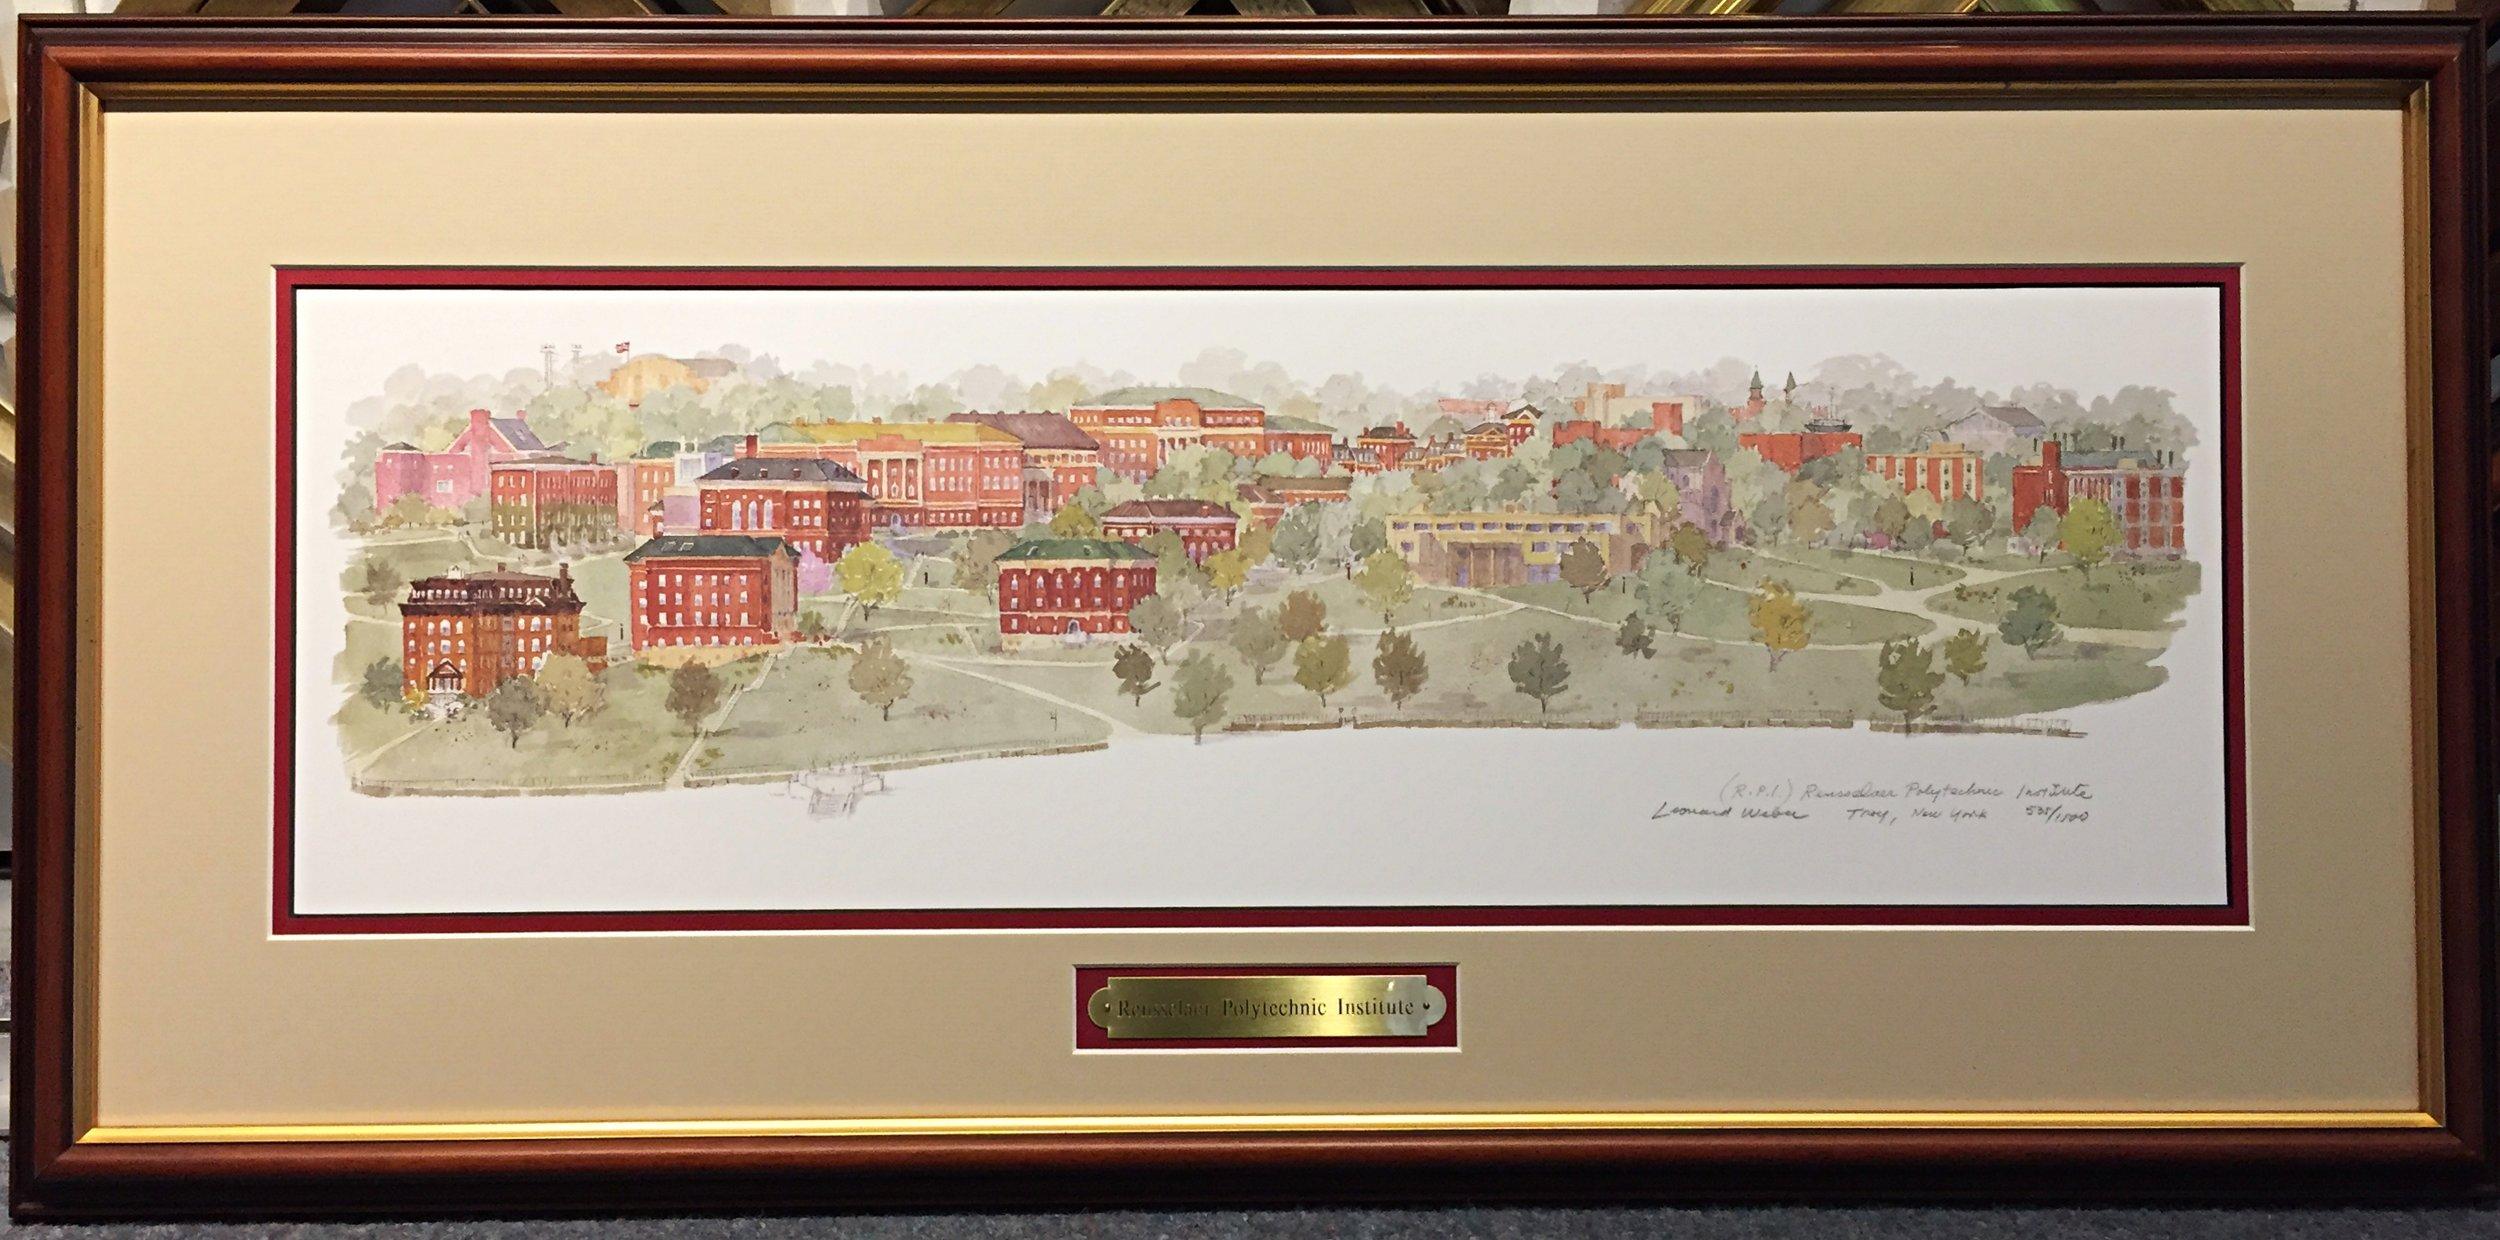 RPI Campus by Leonard Weber